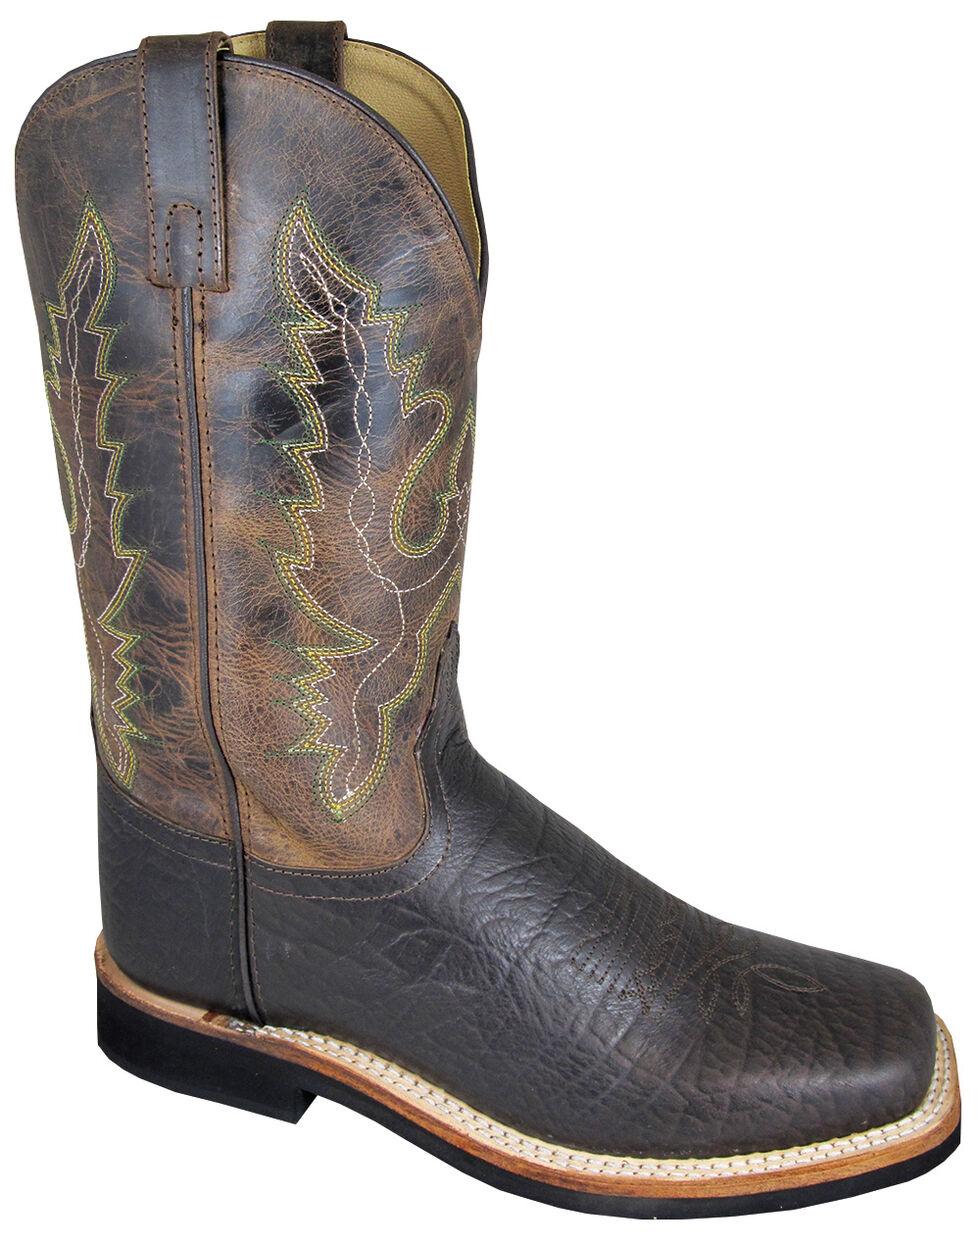 Smoky Mountain Men's Roger Cowboy Boots - Square Toe, Brown, hi-res